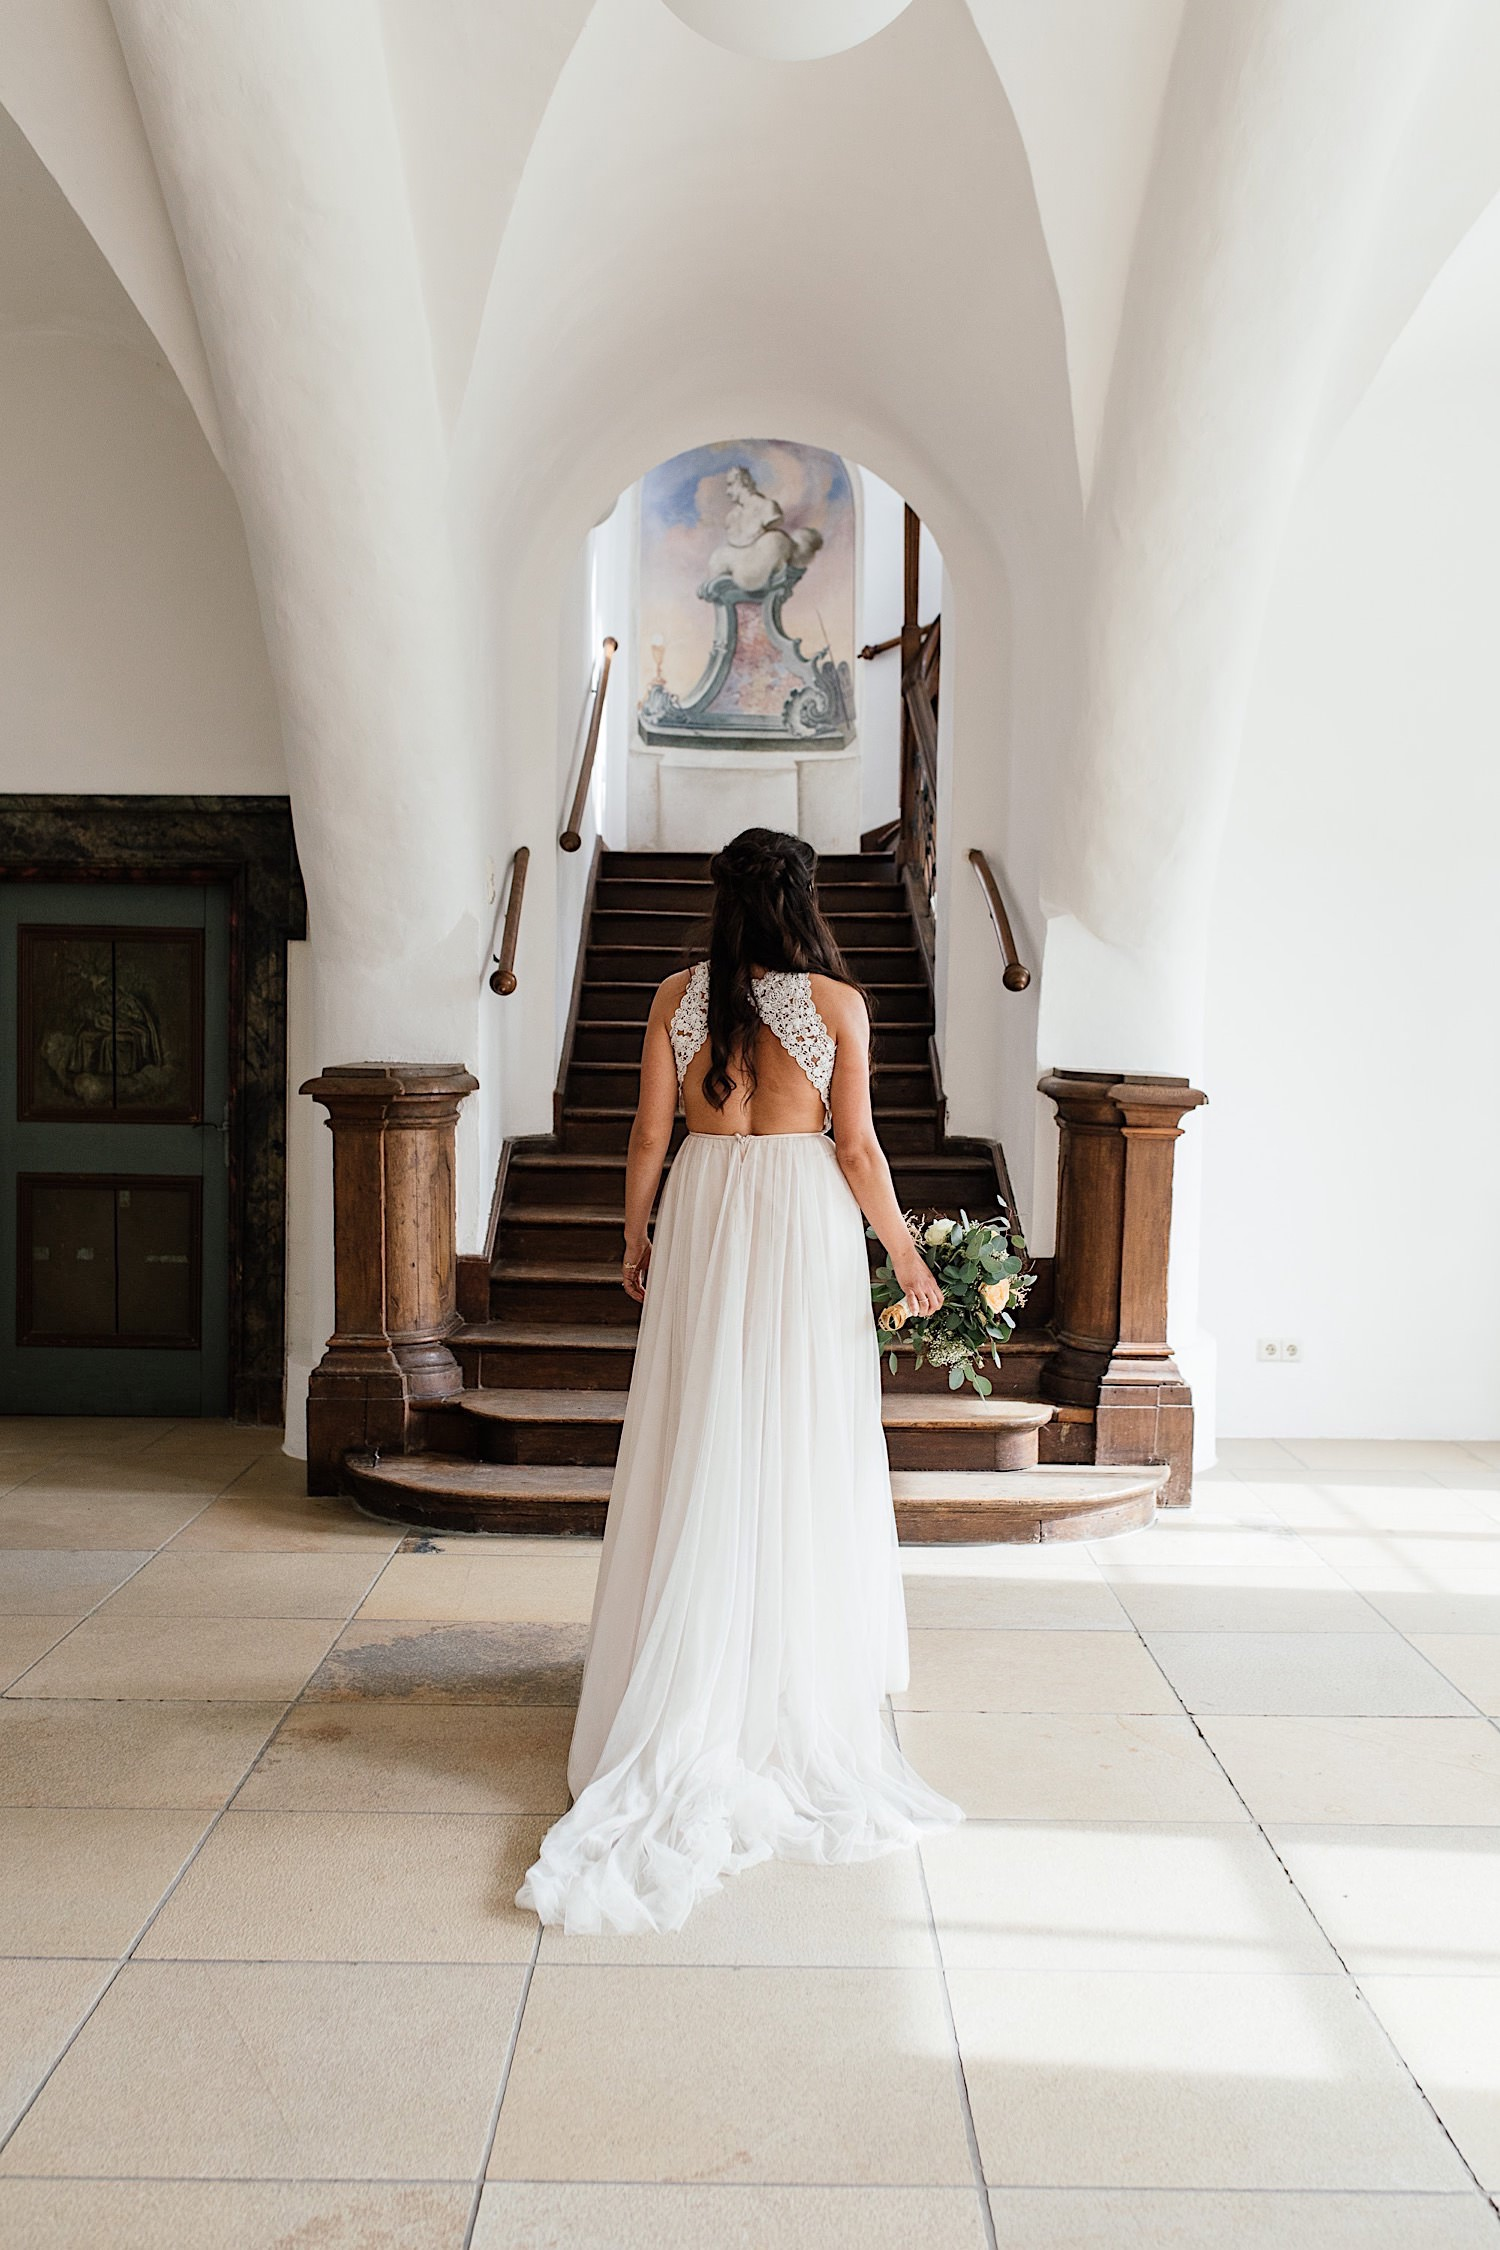 Hochzeitslocation bei Biberach Schloss Ummendorf